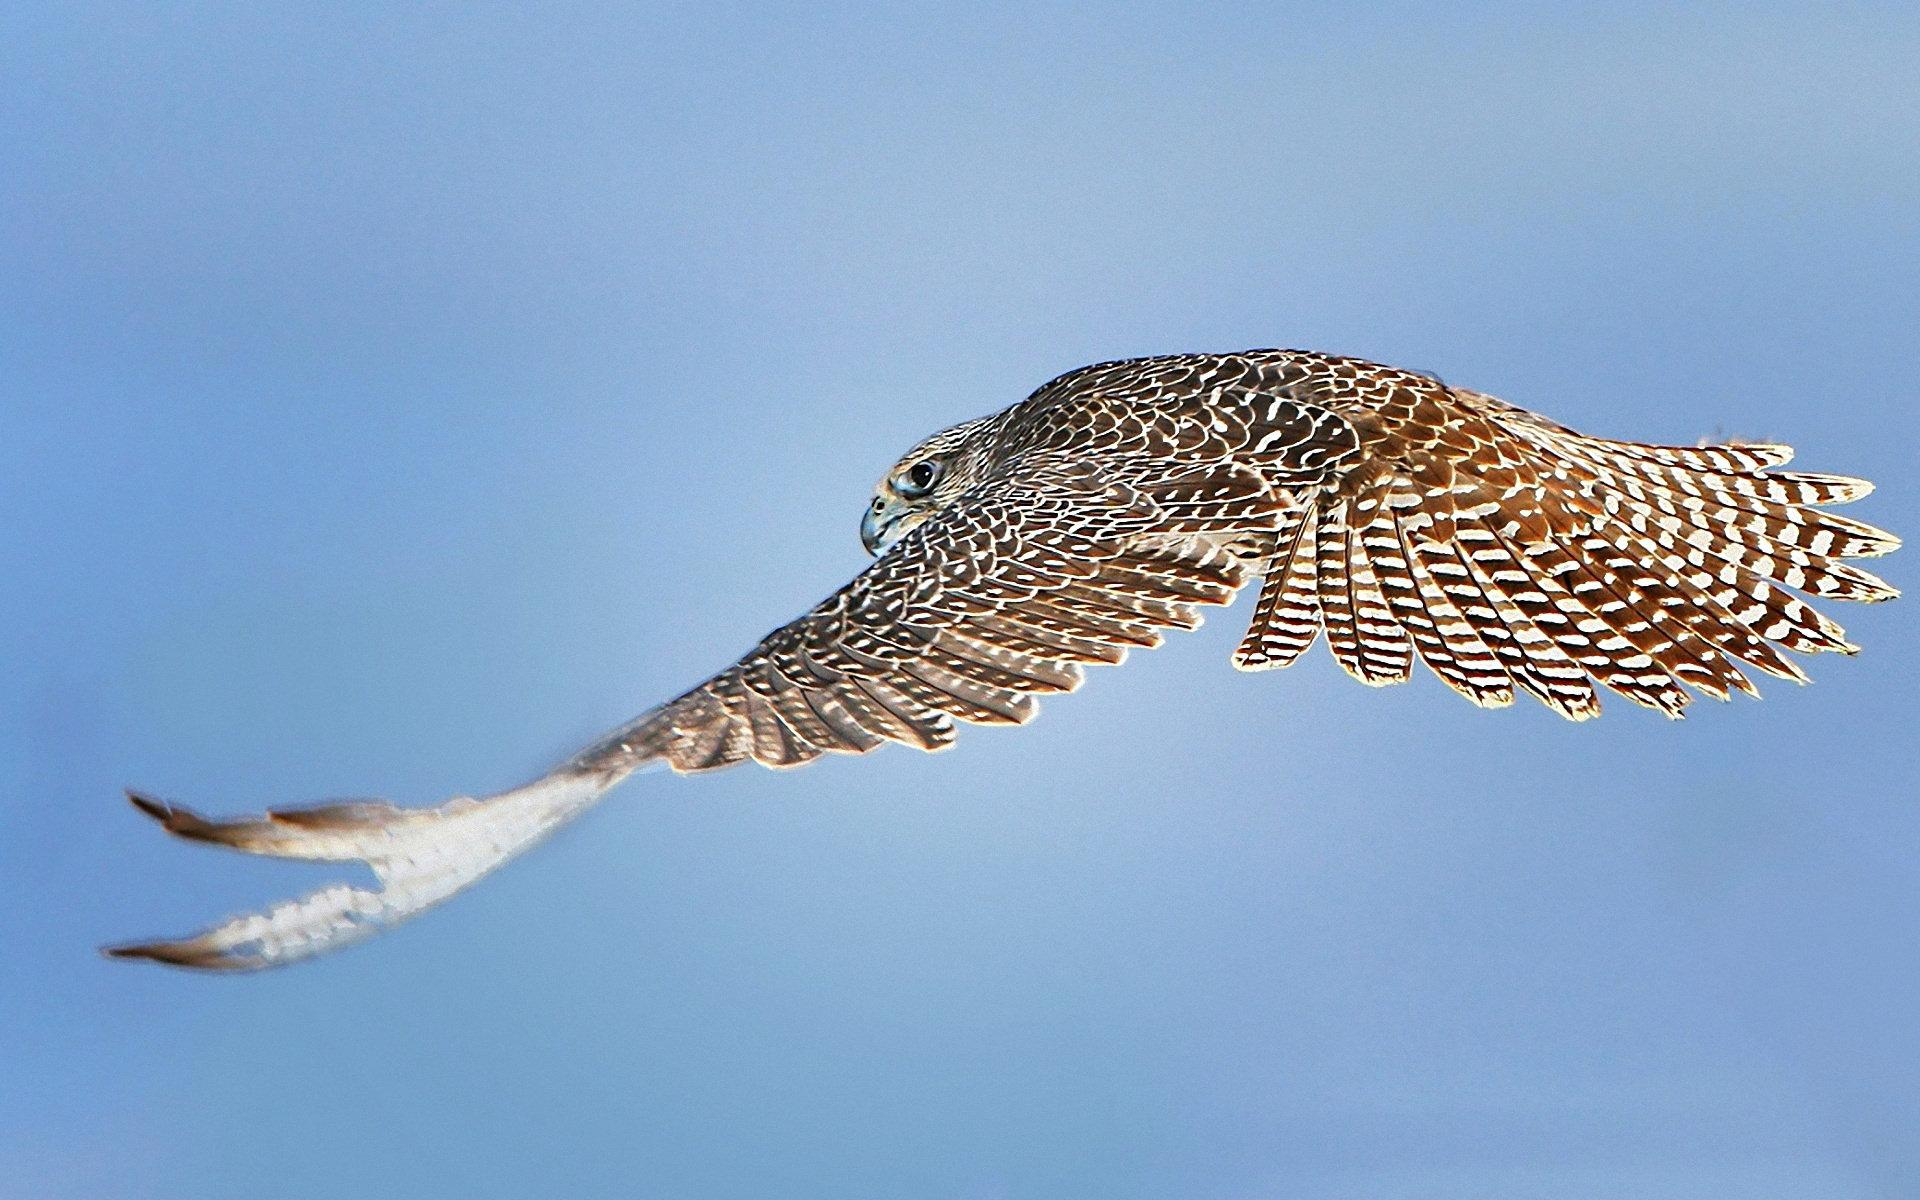 Falcon High Resolution Wallpapers: Peregrine Falcon Wallpaper HD Download